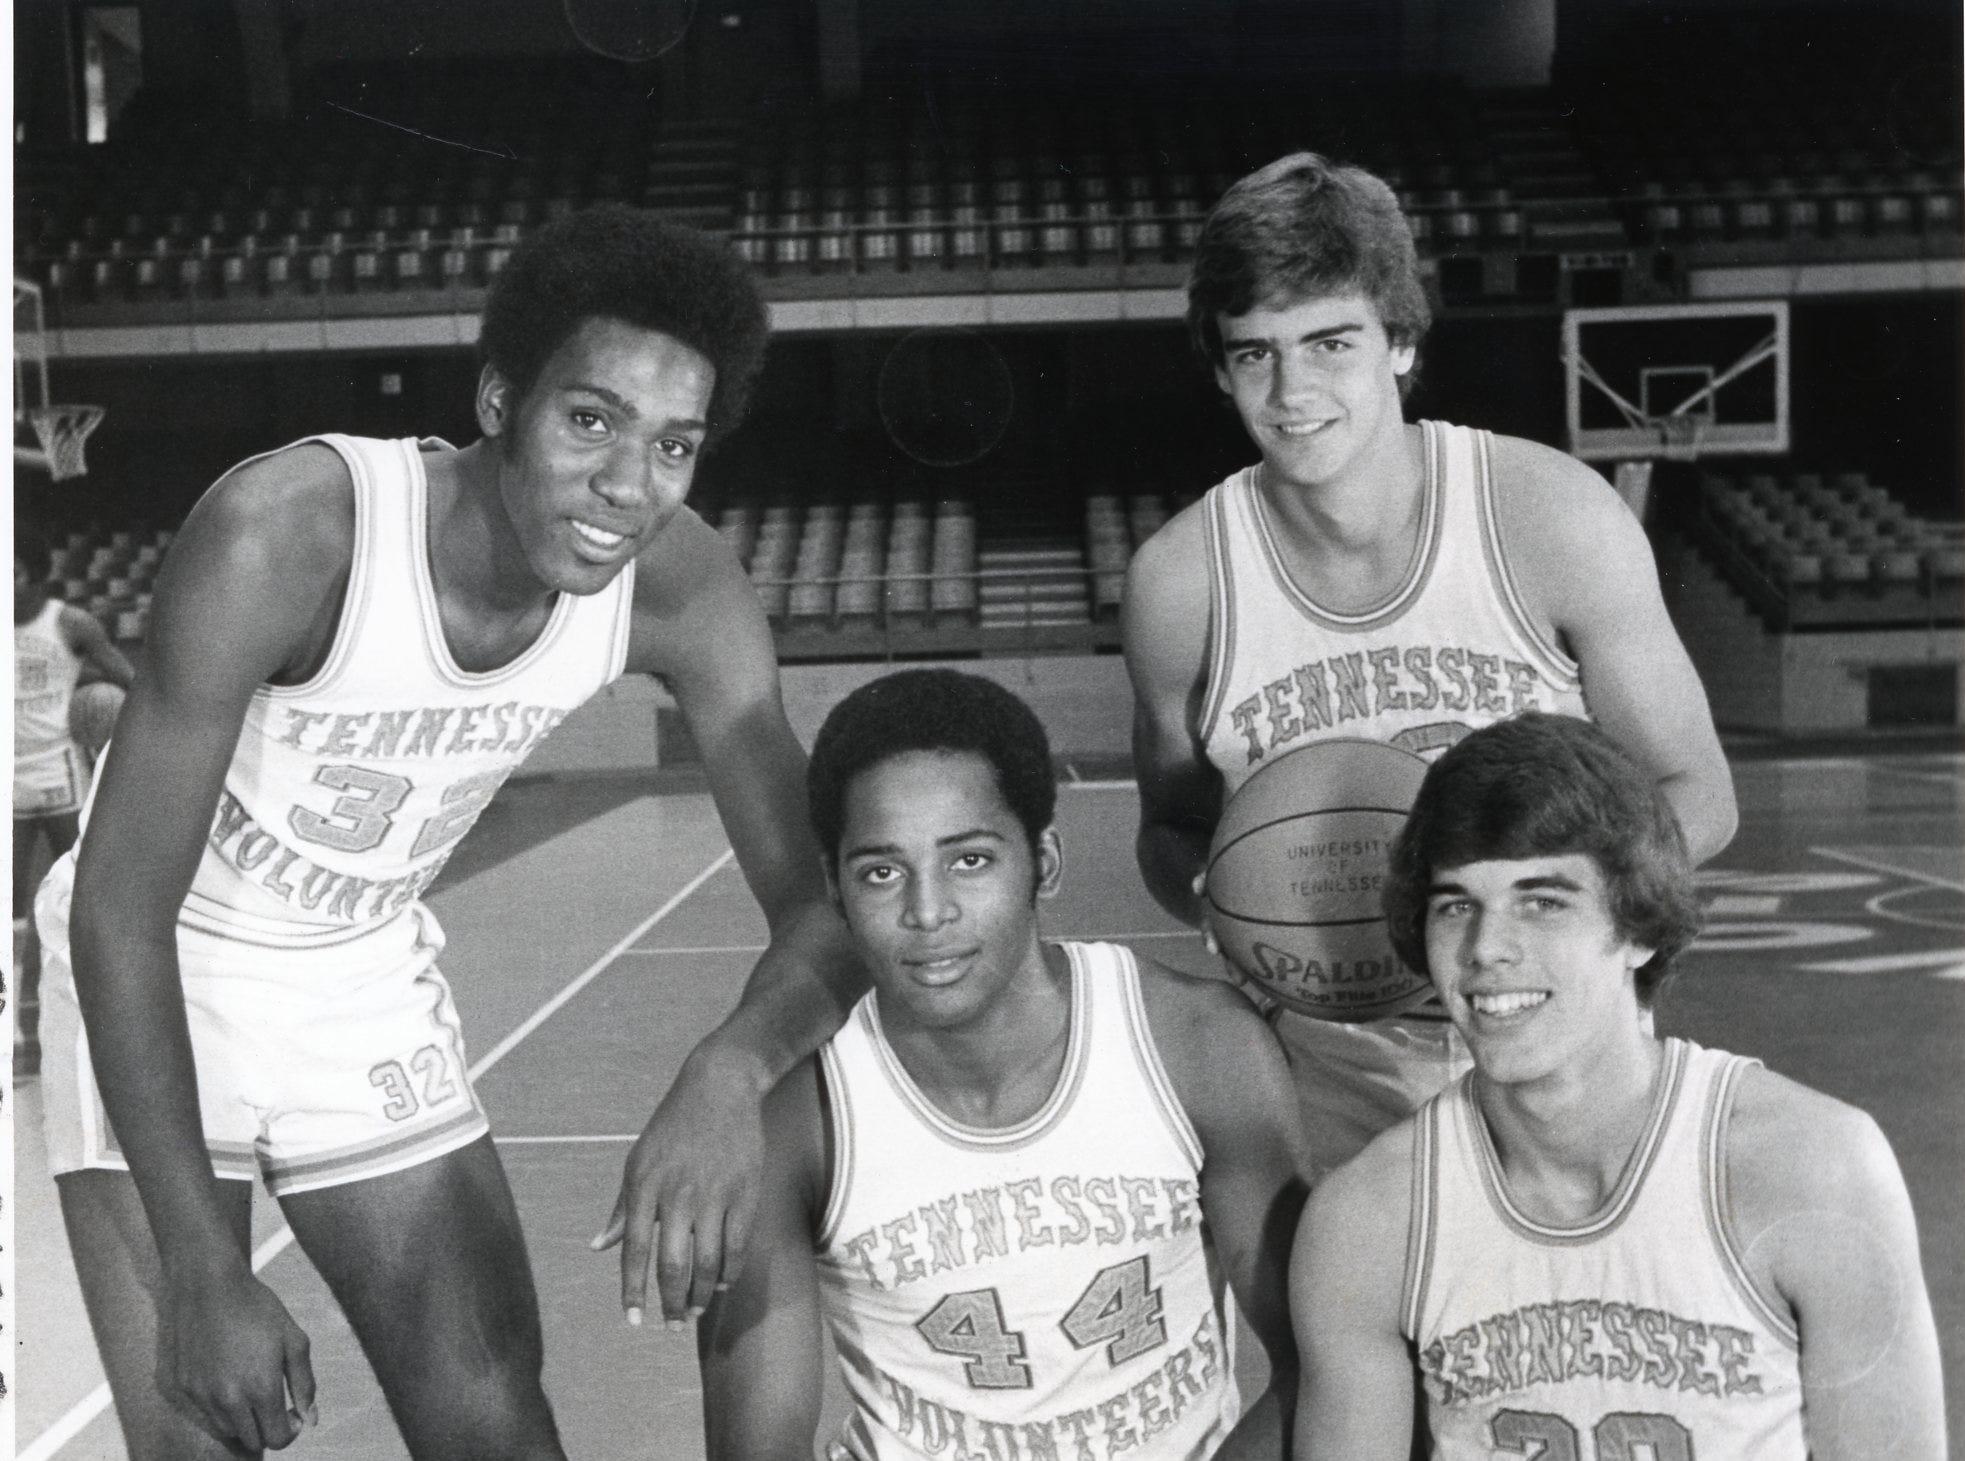 Tennessee's Chuck Threeths (44), Mike Stapleton (20), Reggie Johnson (32) and Bert Bertelkamp in October 1976.